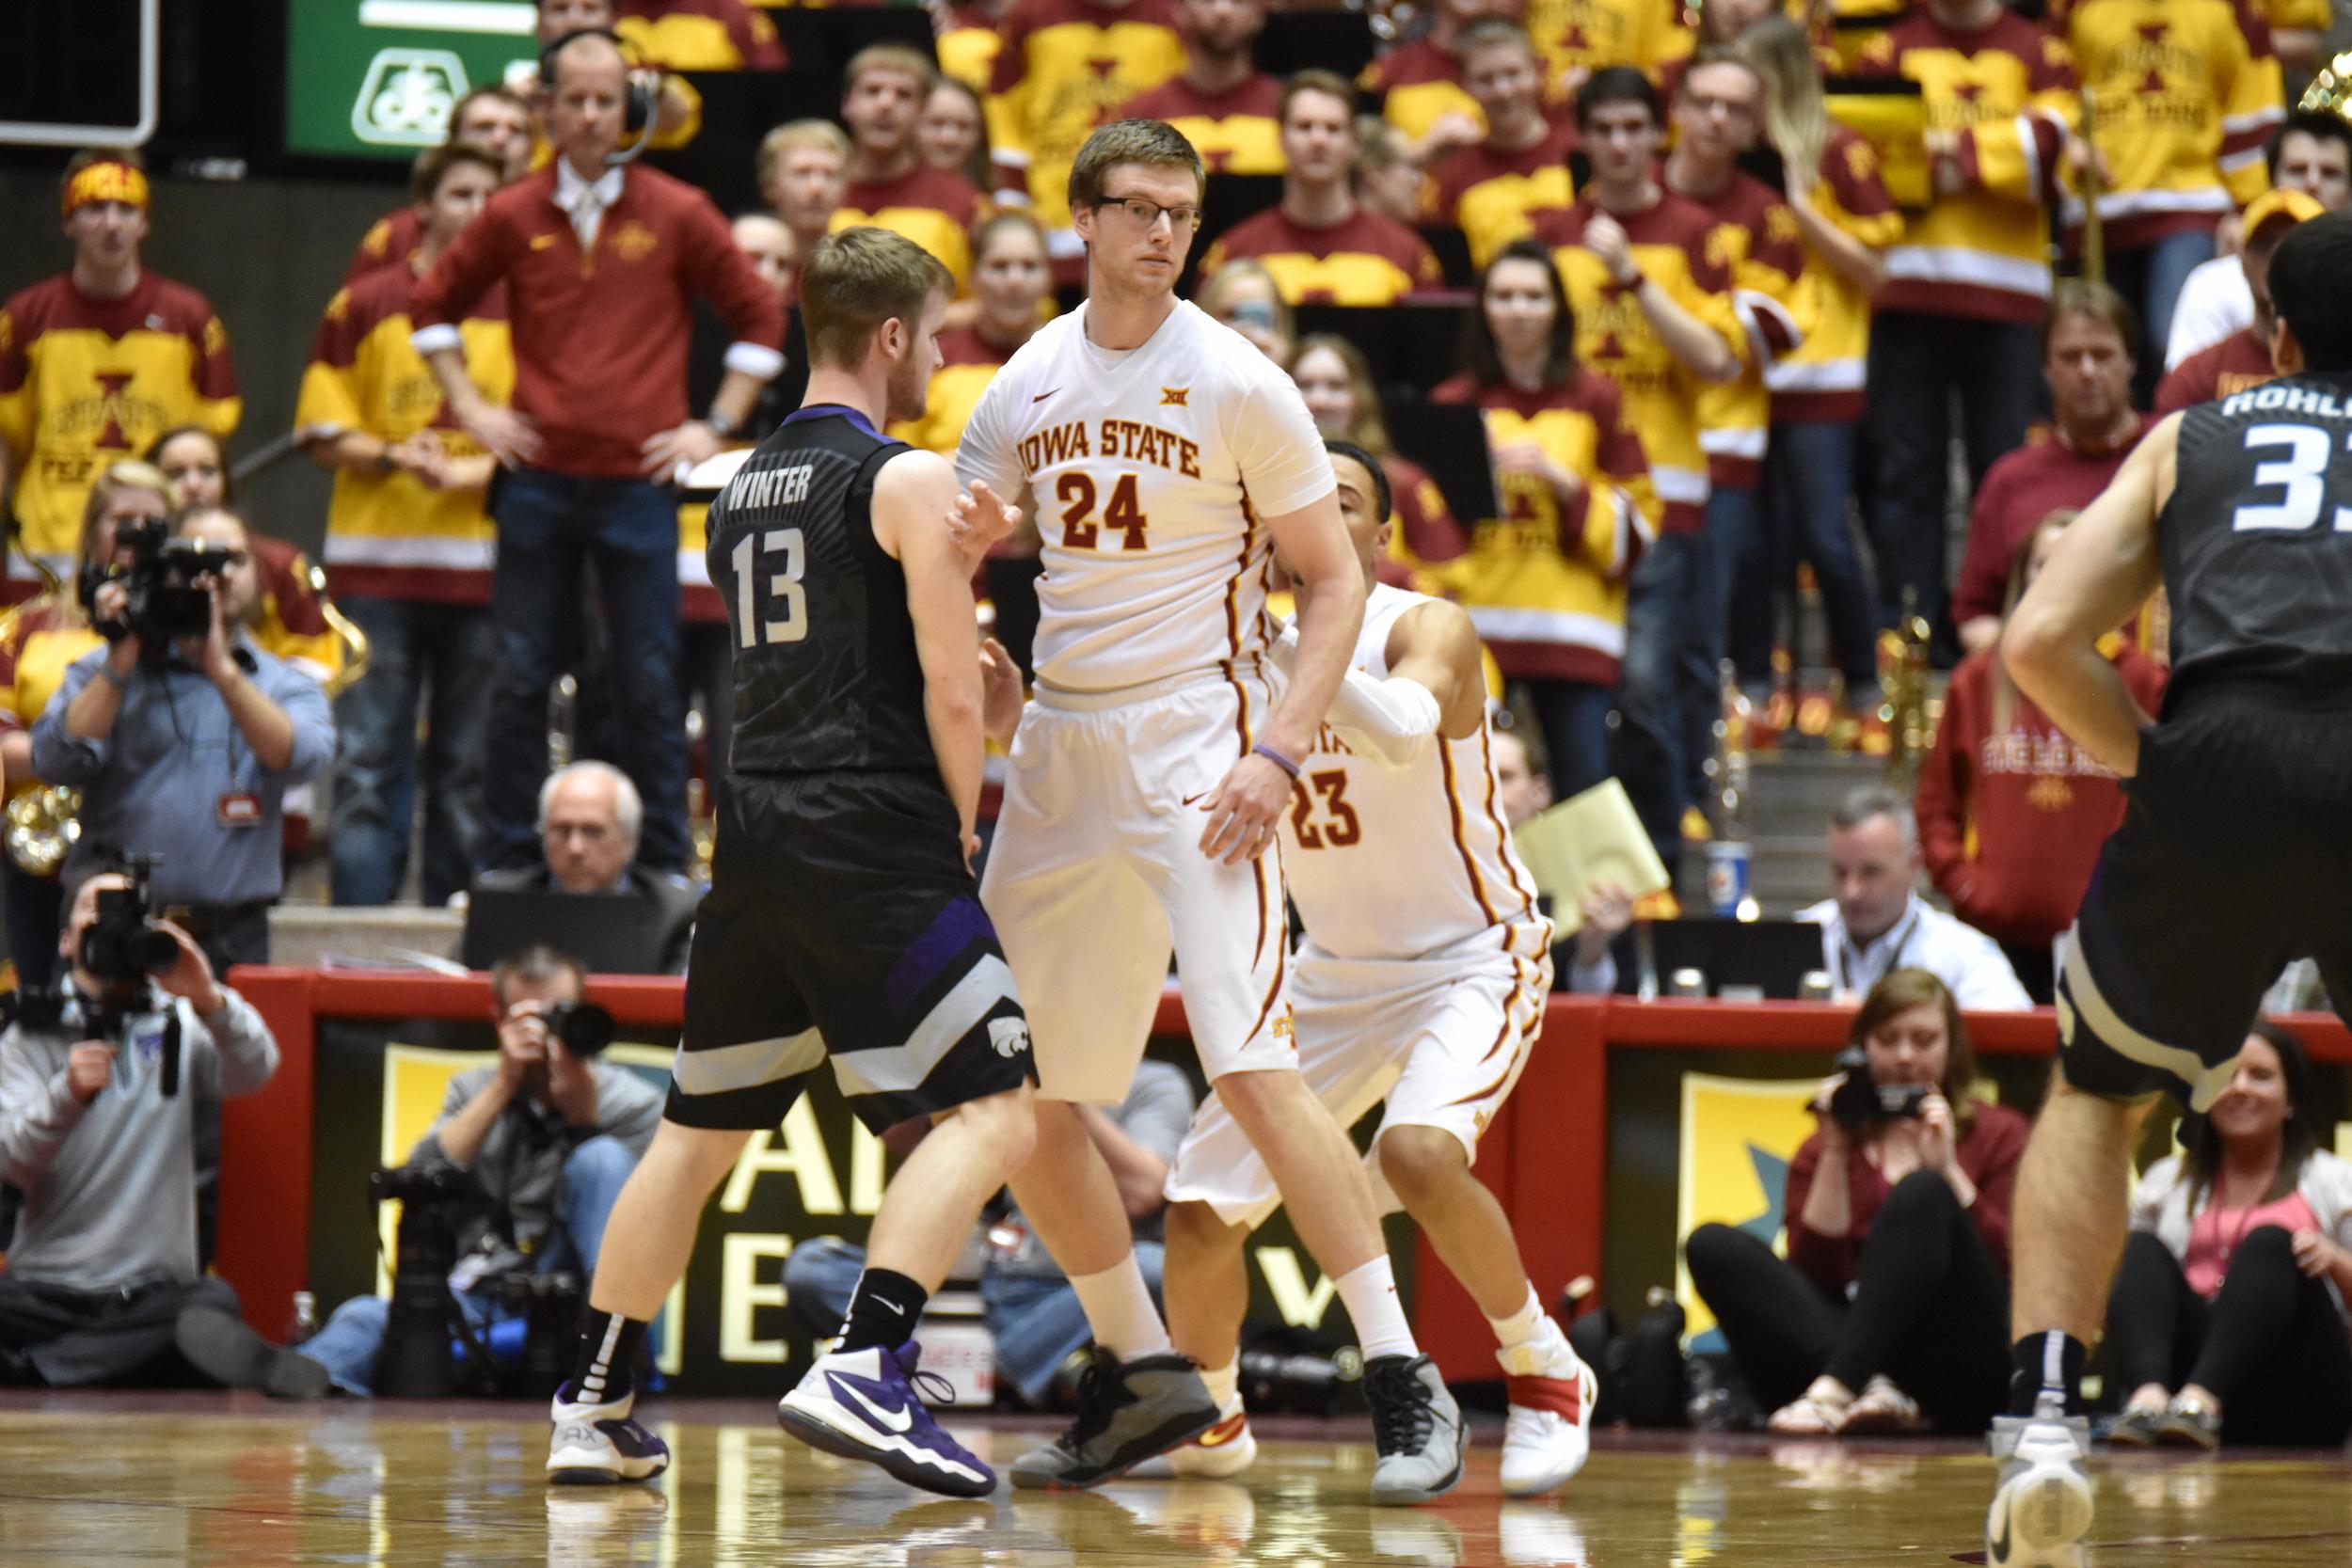 Stu Nezlek guards a Kansas State player in 2016. Photo by Lani Tons/Iowa State Daily